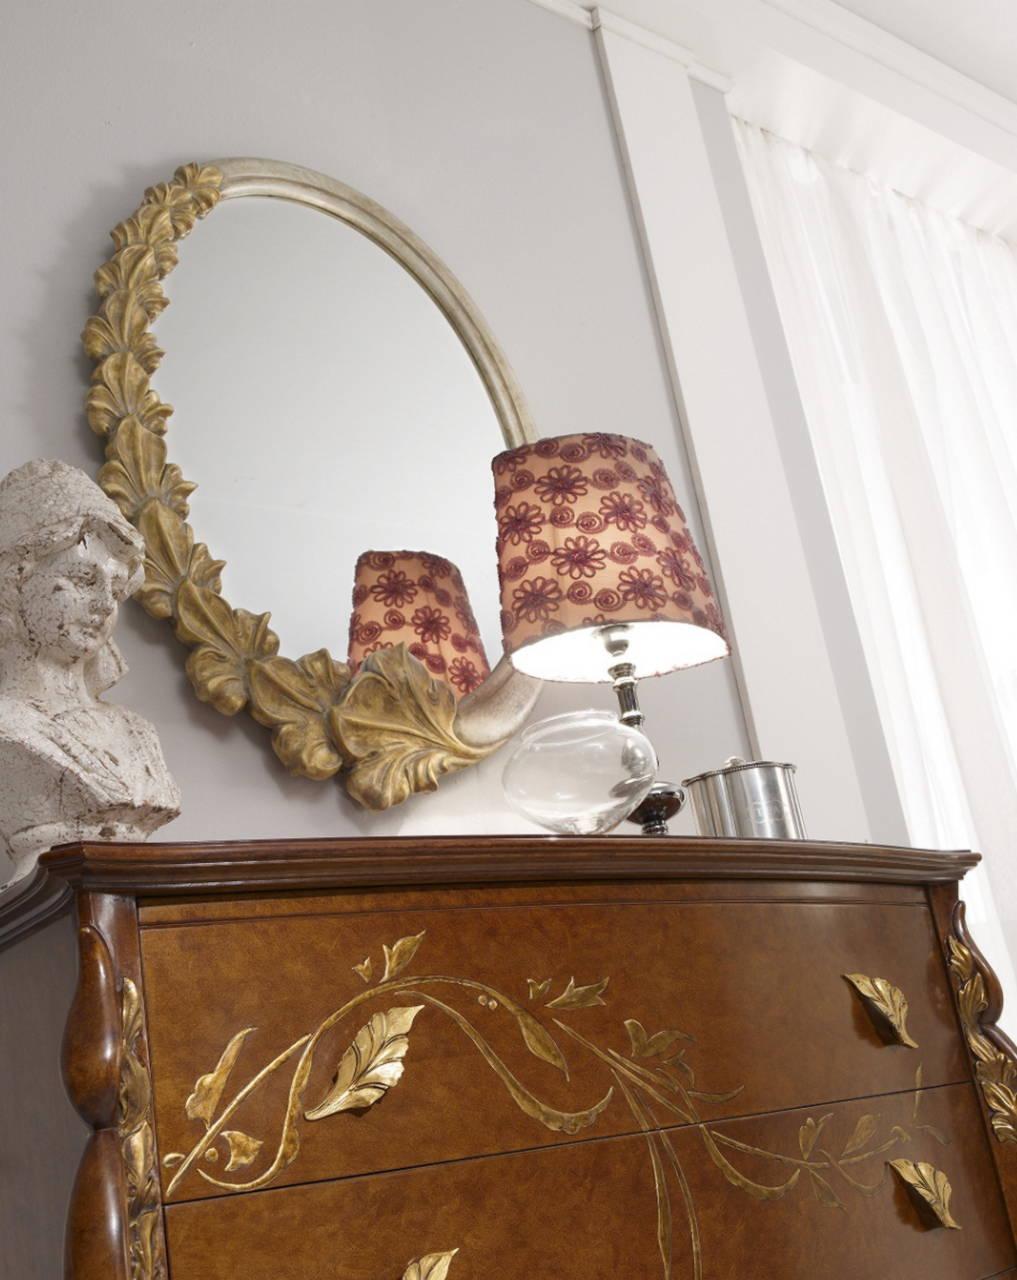 Mobili su misura per camere classiche - Arredamenti per camere a Verona